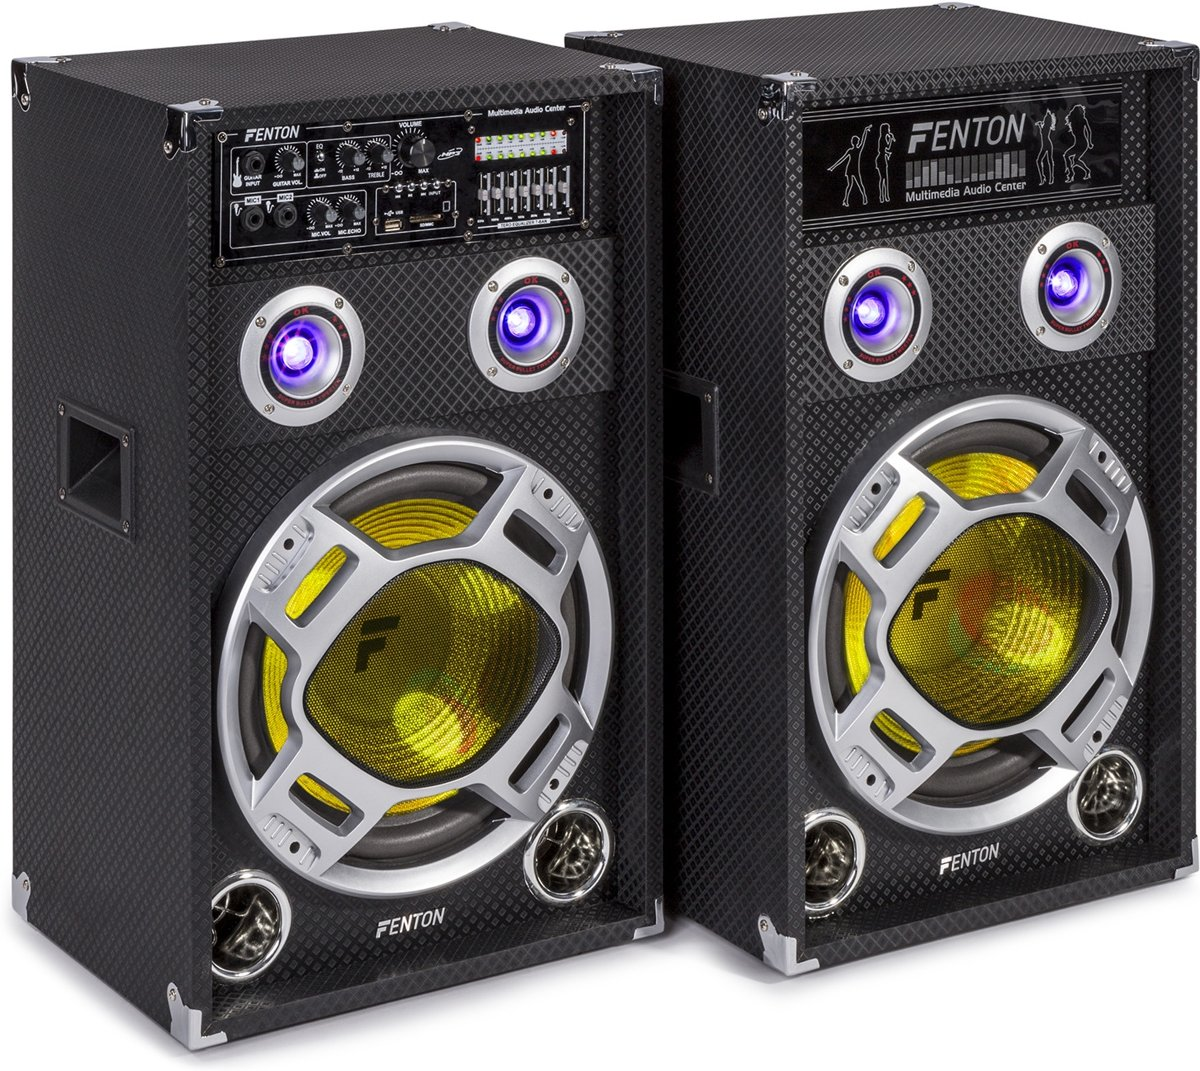 Fenton - KA-12 Actieve USB/RGB LED  Luidsprekers - 2 stuks - Zwart kopen